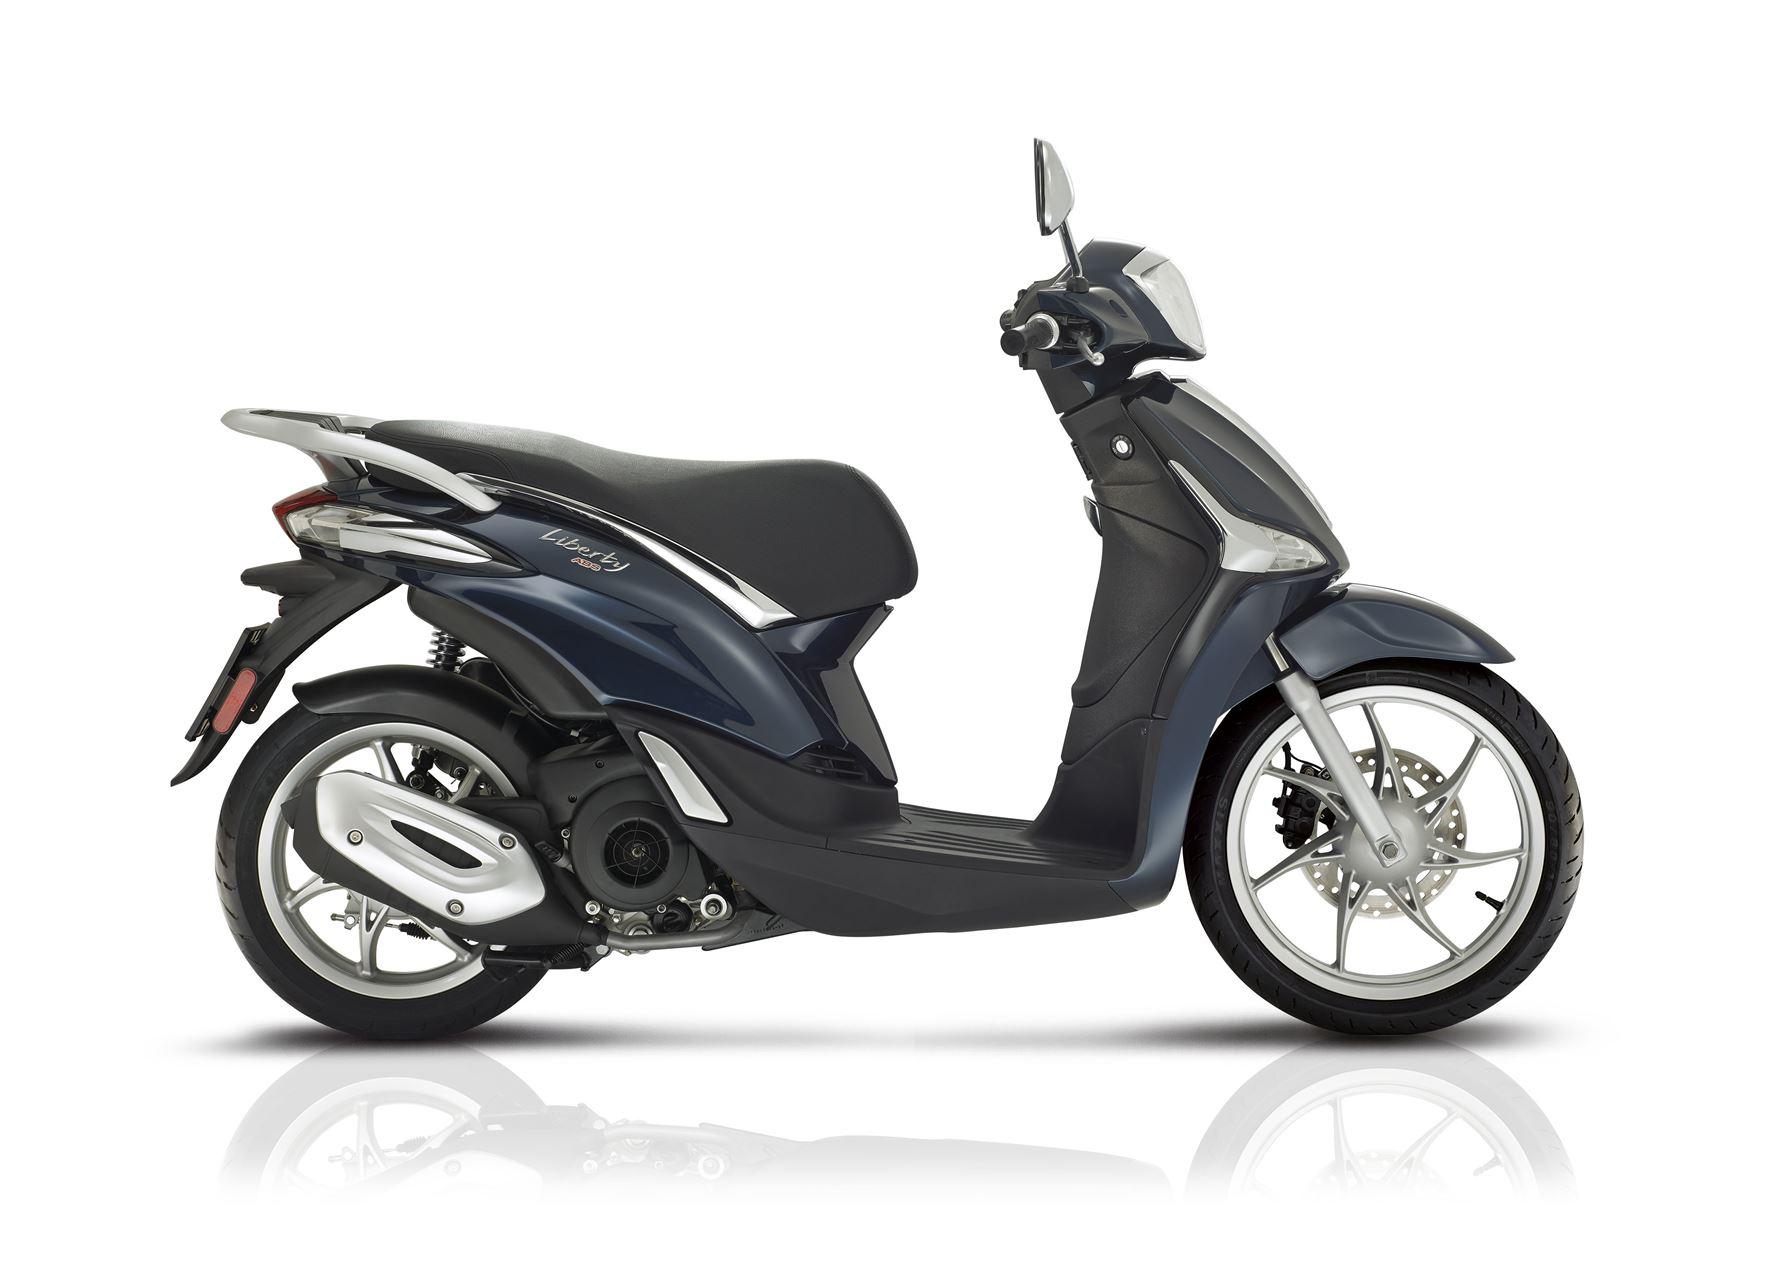 piaggio liberty 125 scooter at 125 cc andar de moto. Black Bedroom Furniture Sets. Home Design Ideas